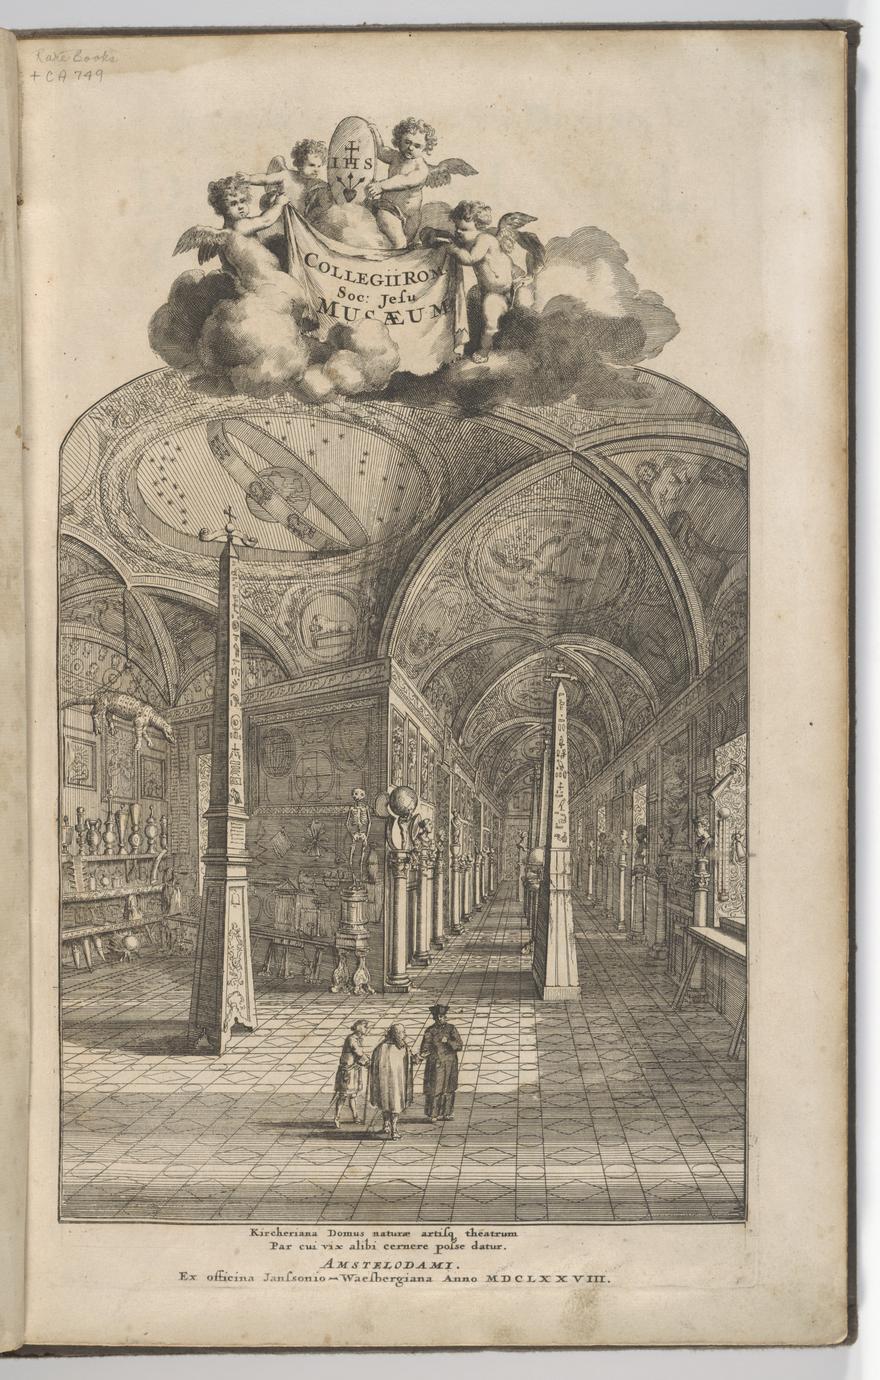 Kircheriana domus naturae artisq theatrum